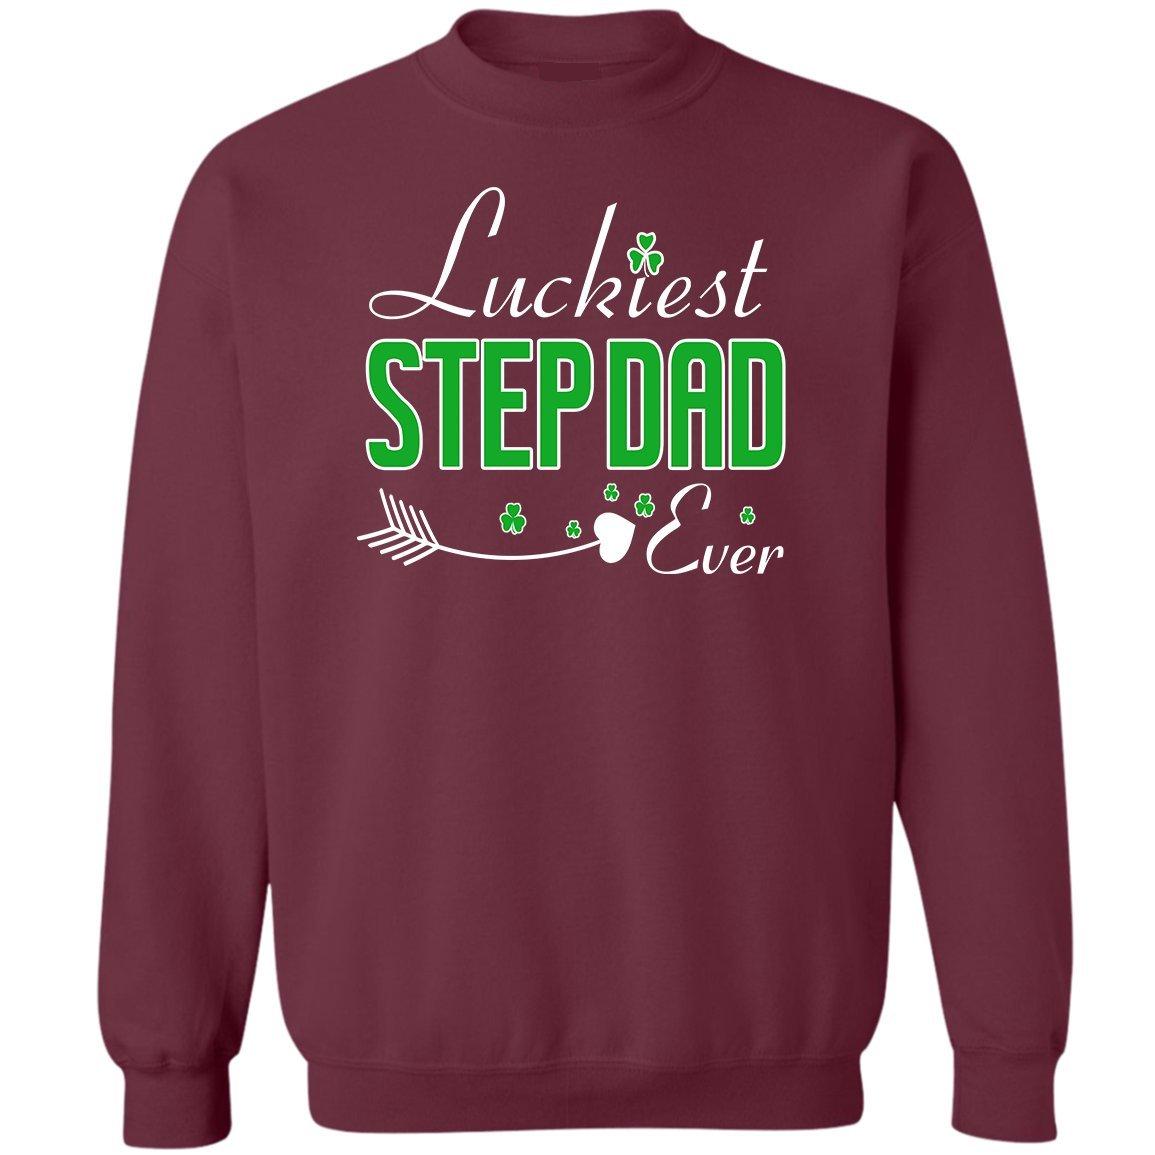 Love Stepdad Sweatshirt VADOBA Luckiest Step Dad Ever ST Patricks Day Tee Funny Gift